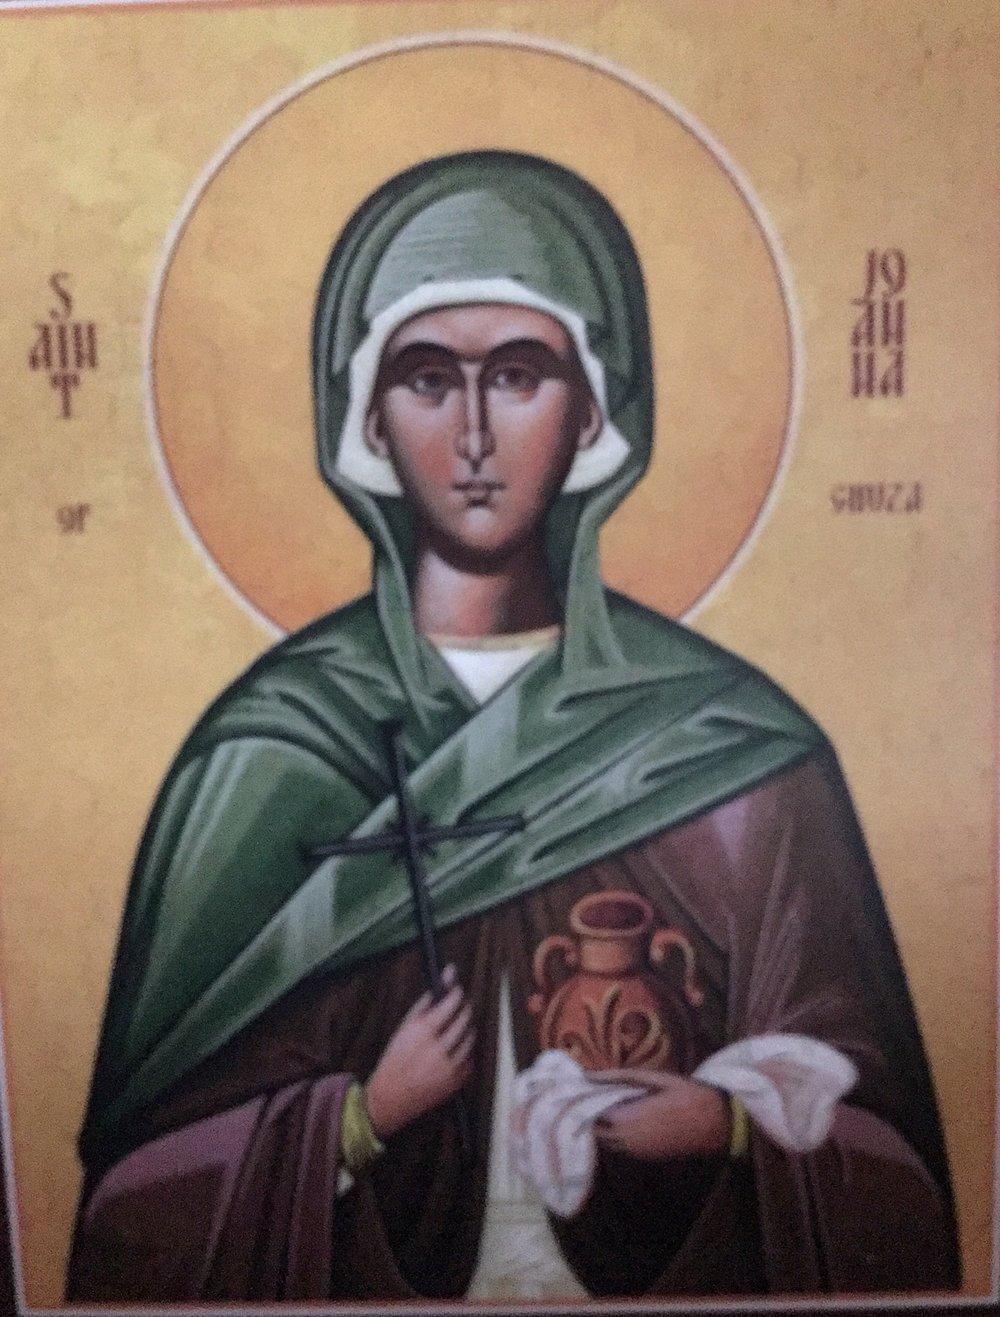 st. joanna copy 2.jpg